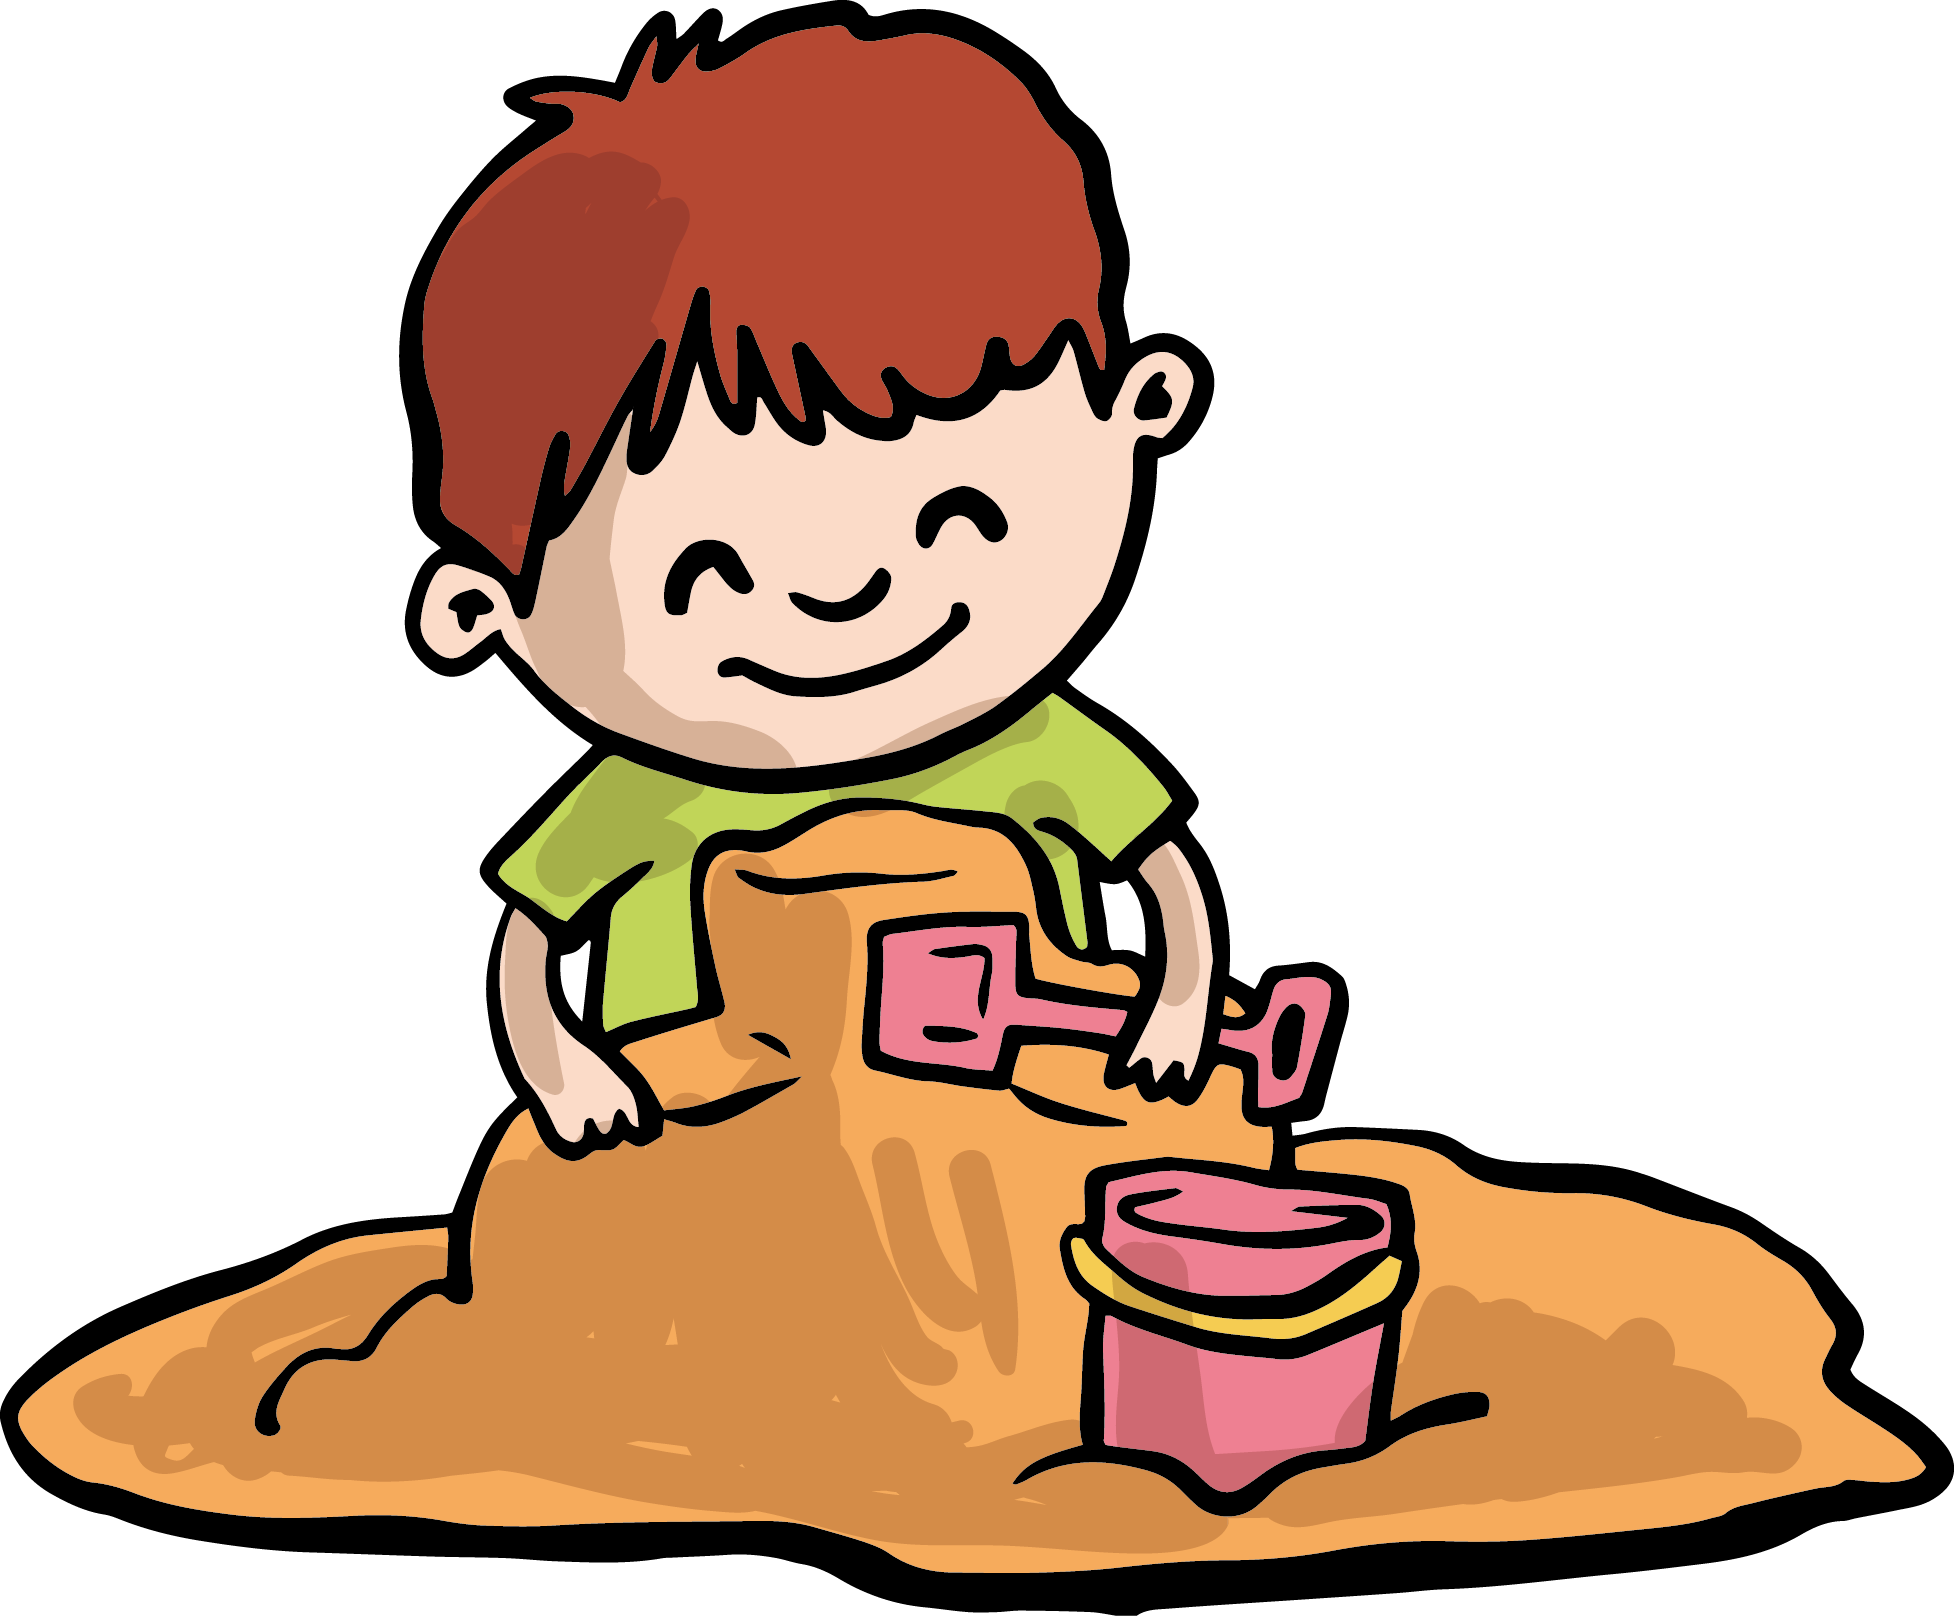 clipart Sand play child clip. Gum clipart boy